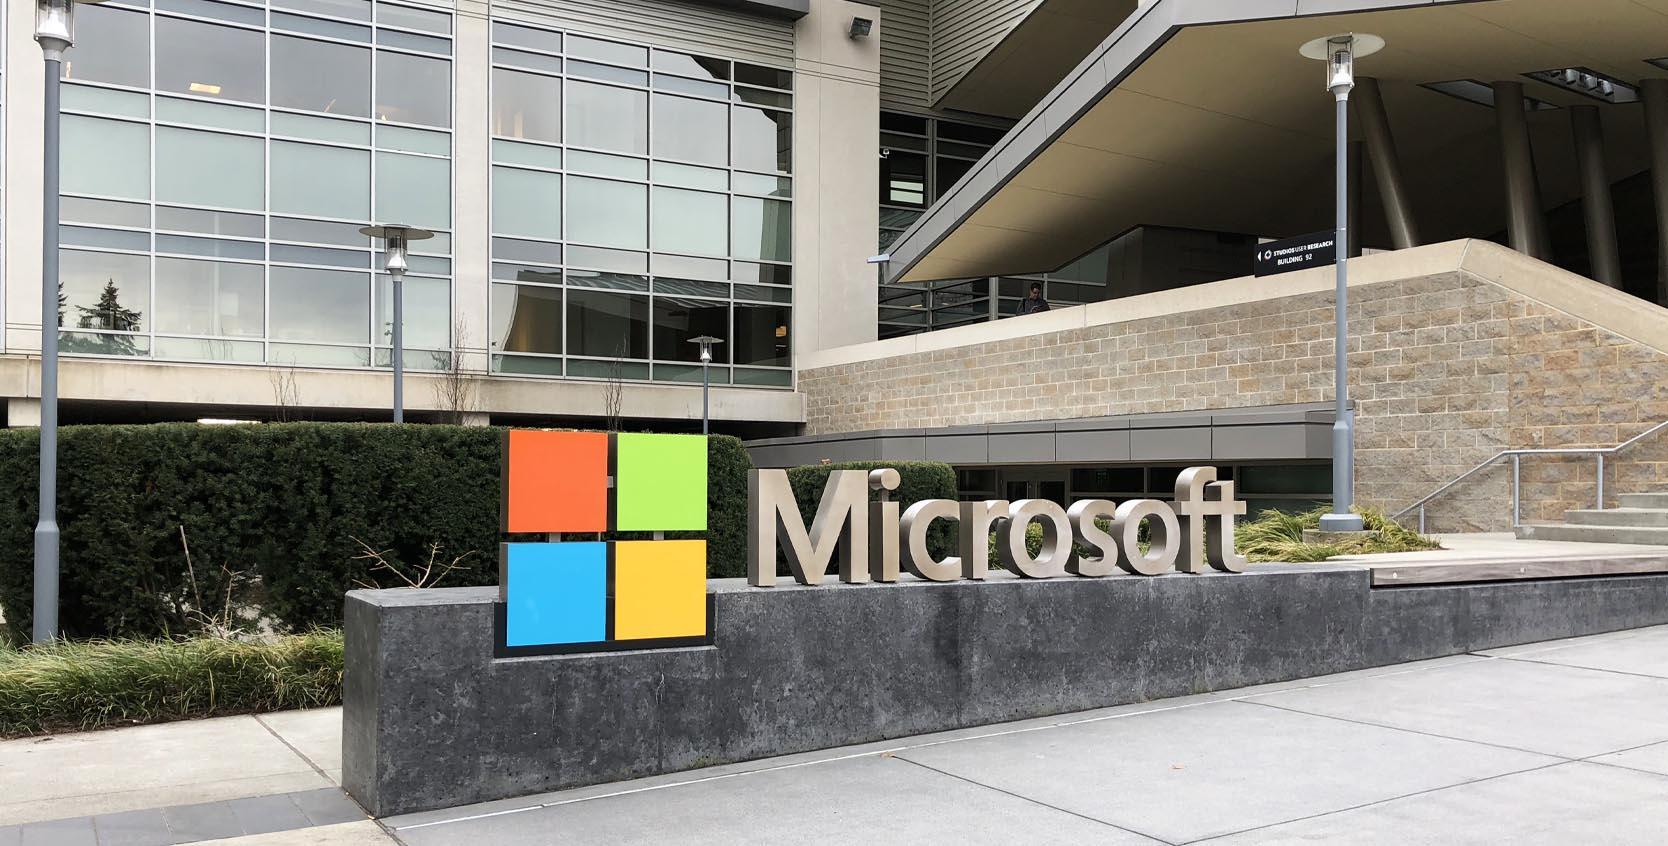 Office 365 versus Microsoft 365